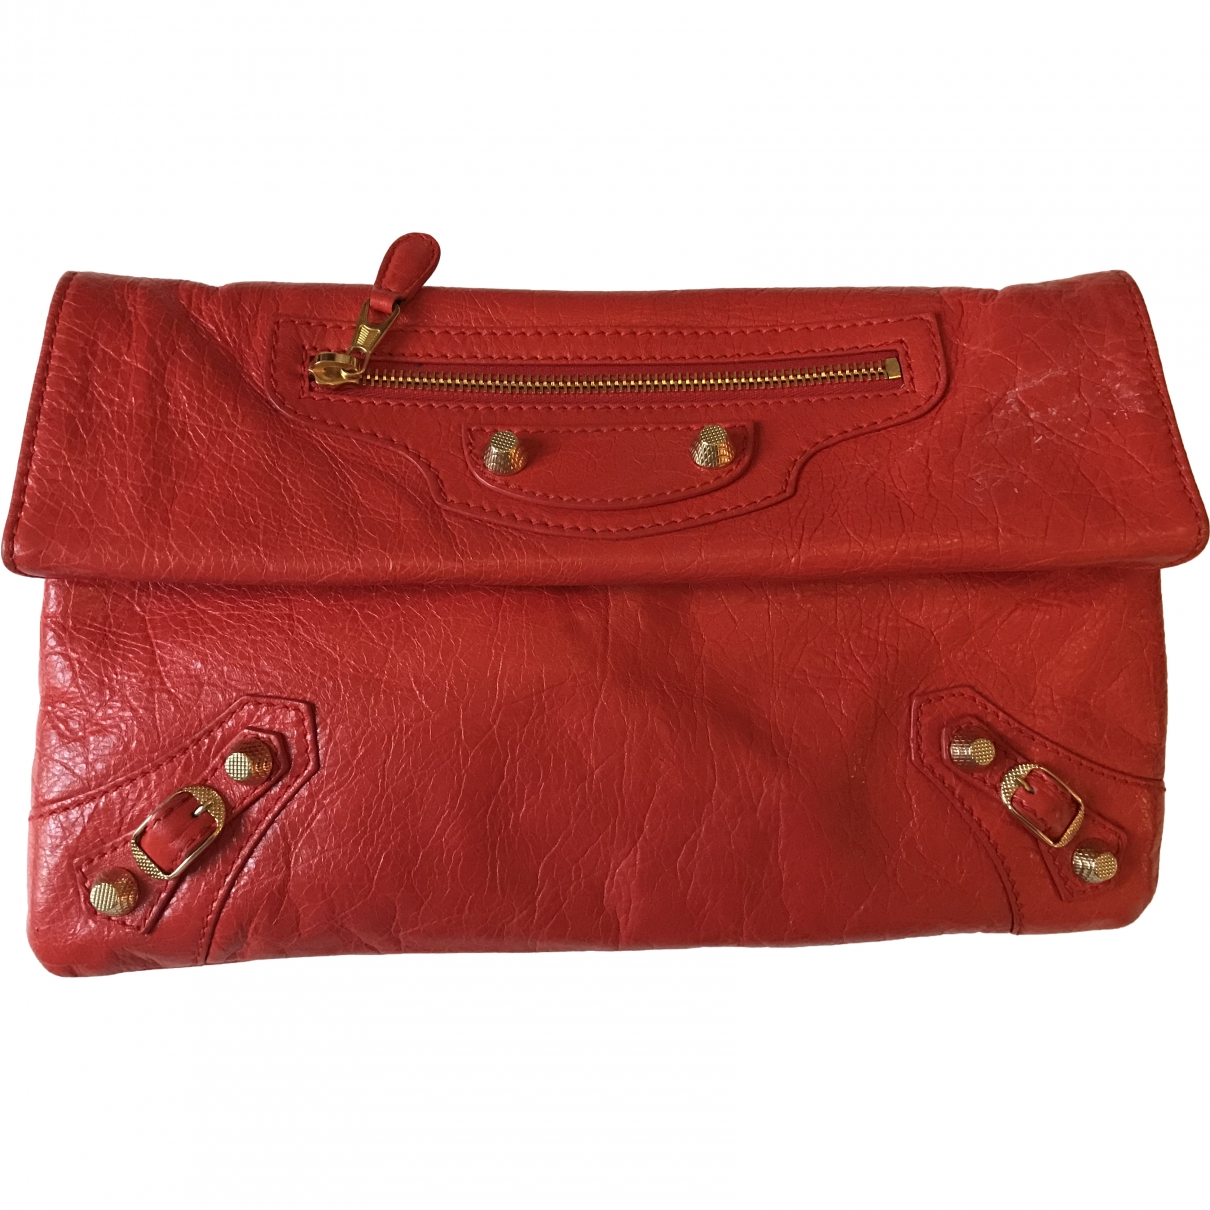 Balenciaga Envelop Orange Leather Clutch bag for Women \N